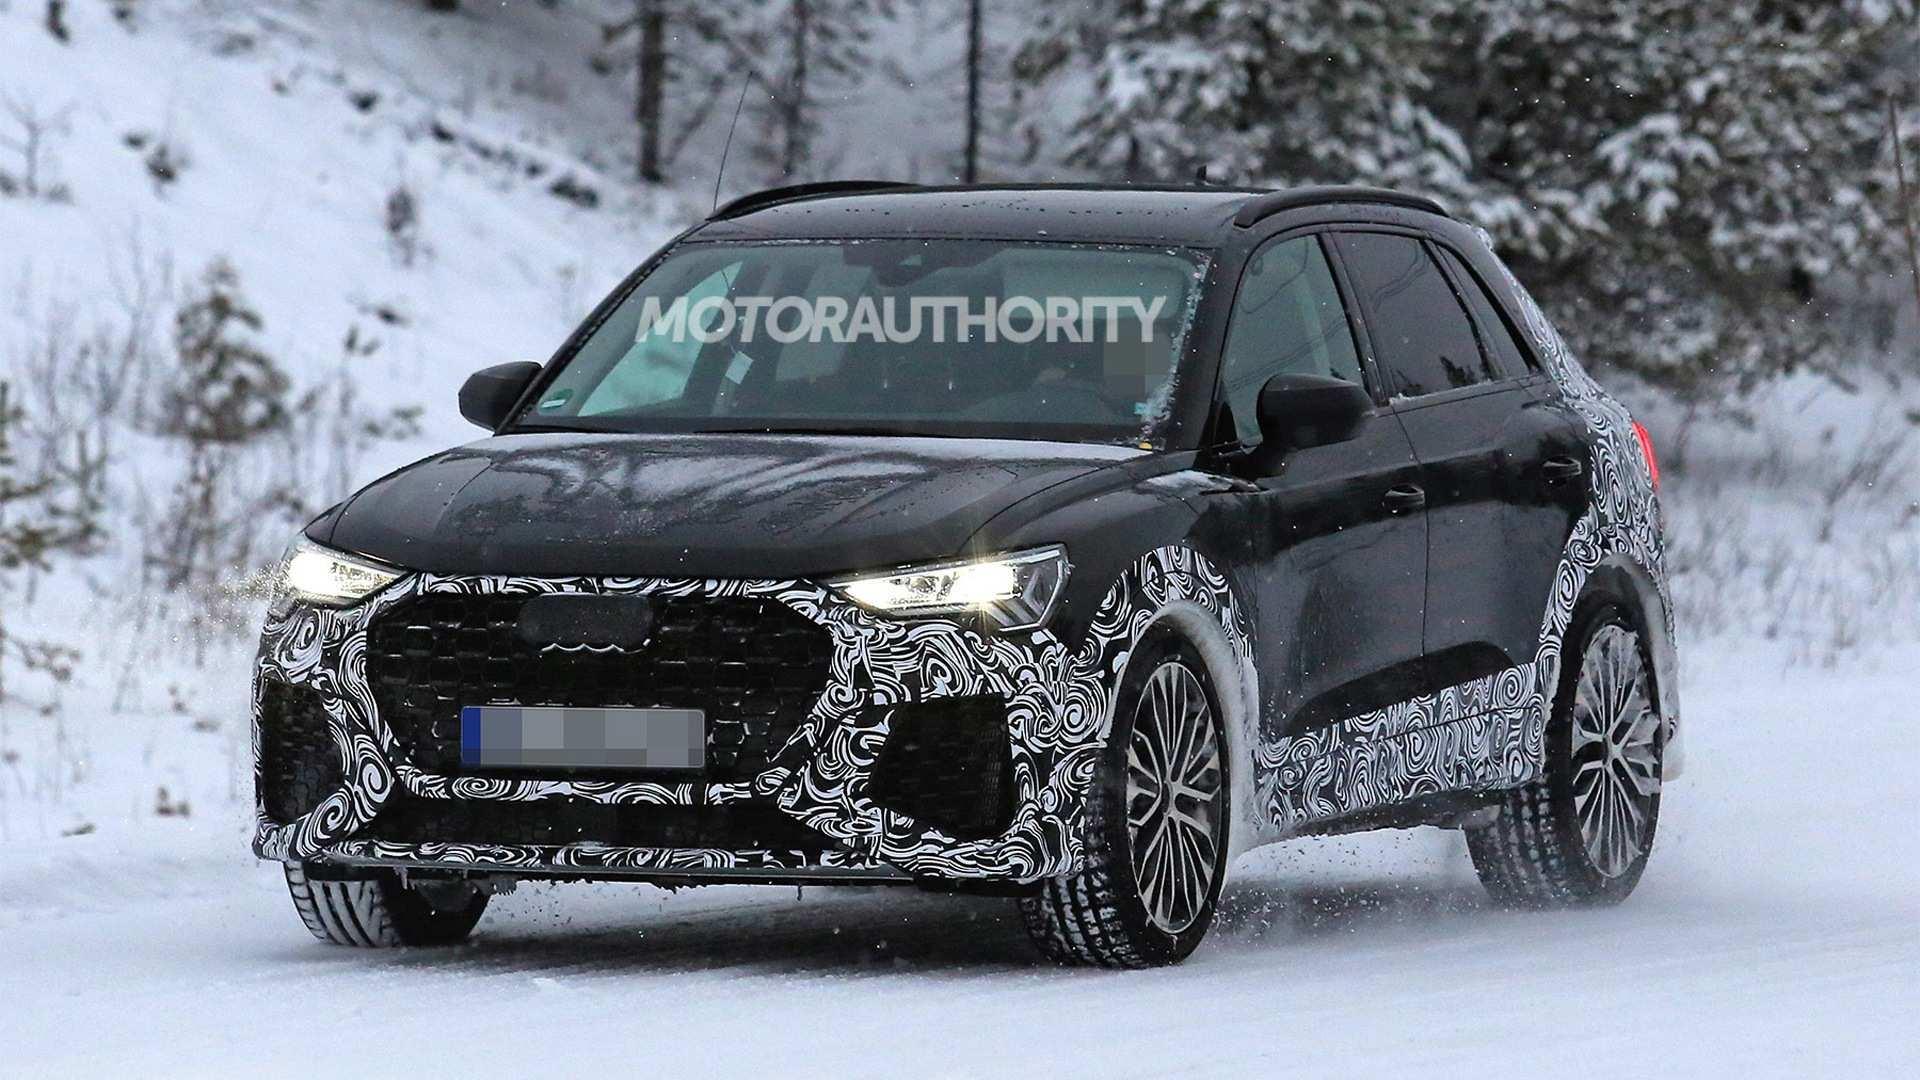 80 Great New Audi Q 2019 Spy Shoot Spesification for New Audi Q 2019 Spy Shoot